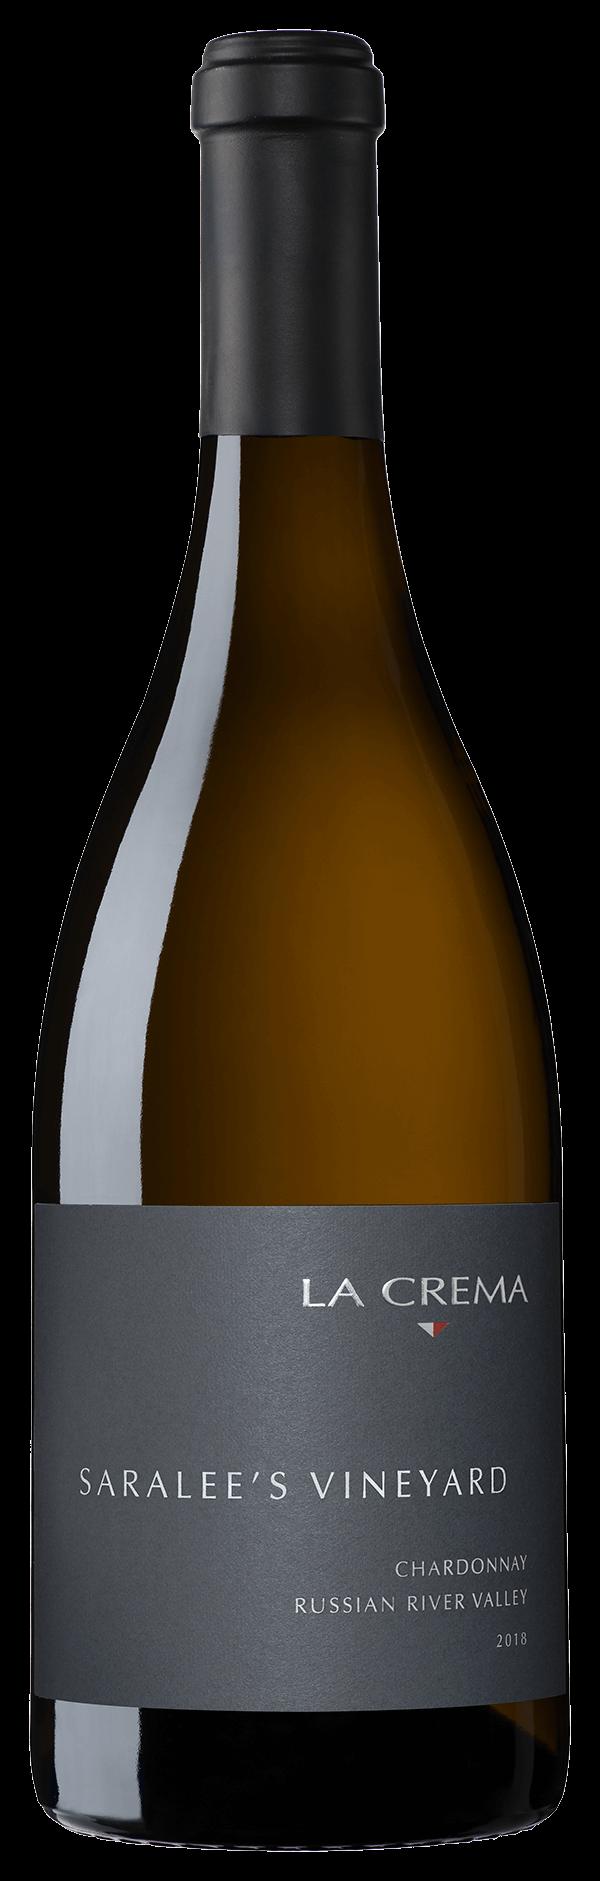 2018 Saralee's Vineyard Chardonnay